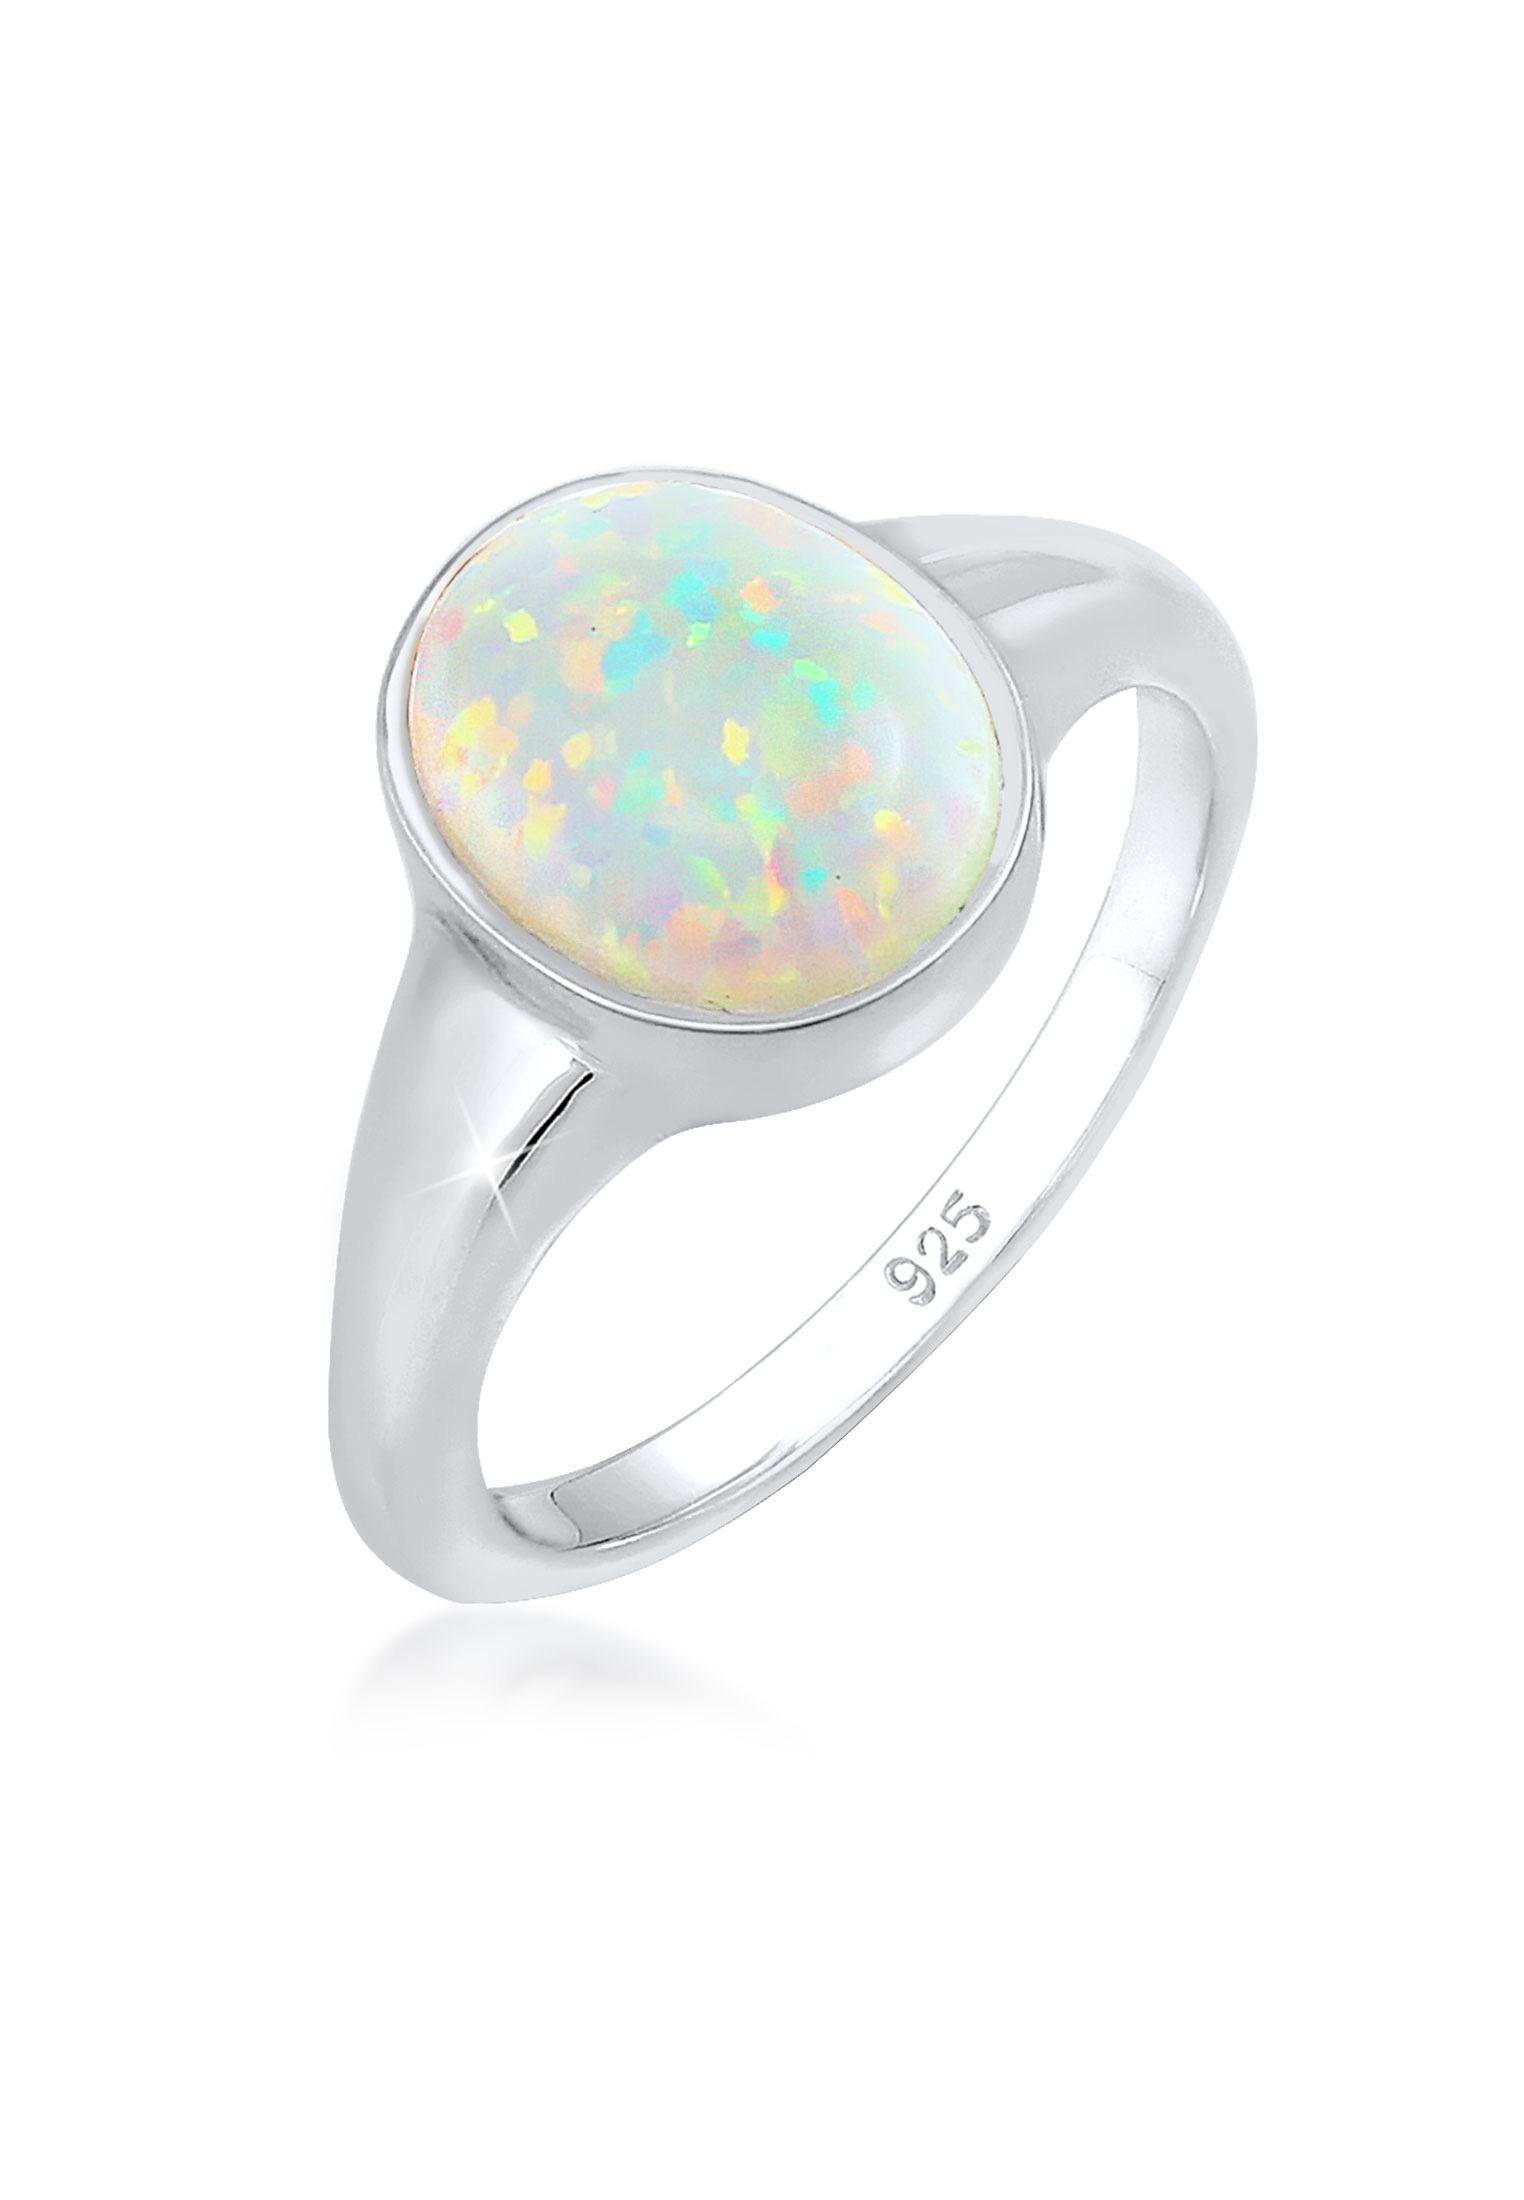 Siegelring   Opal ( Weiß )   925 Sterling Silber vergoldet